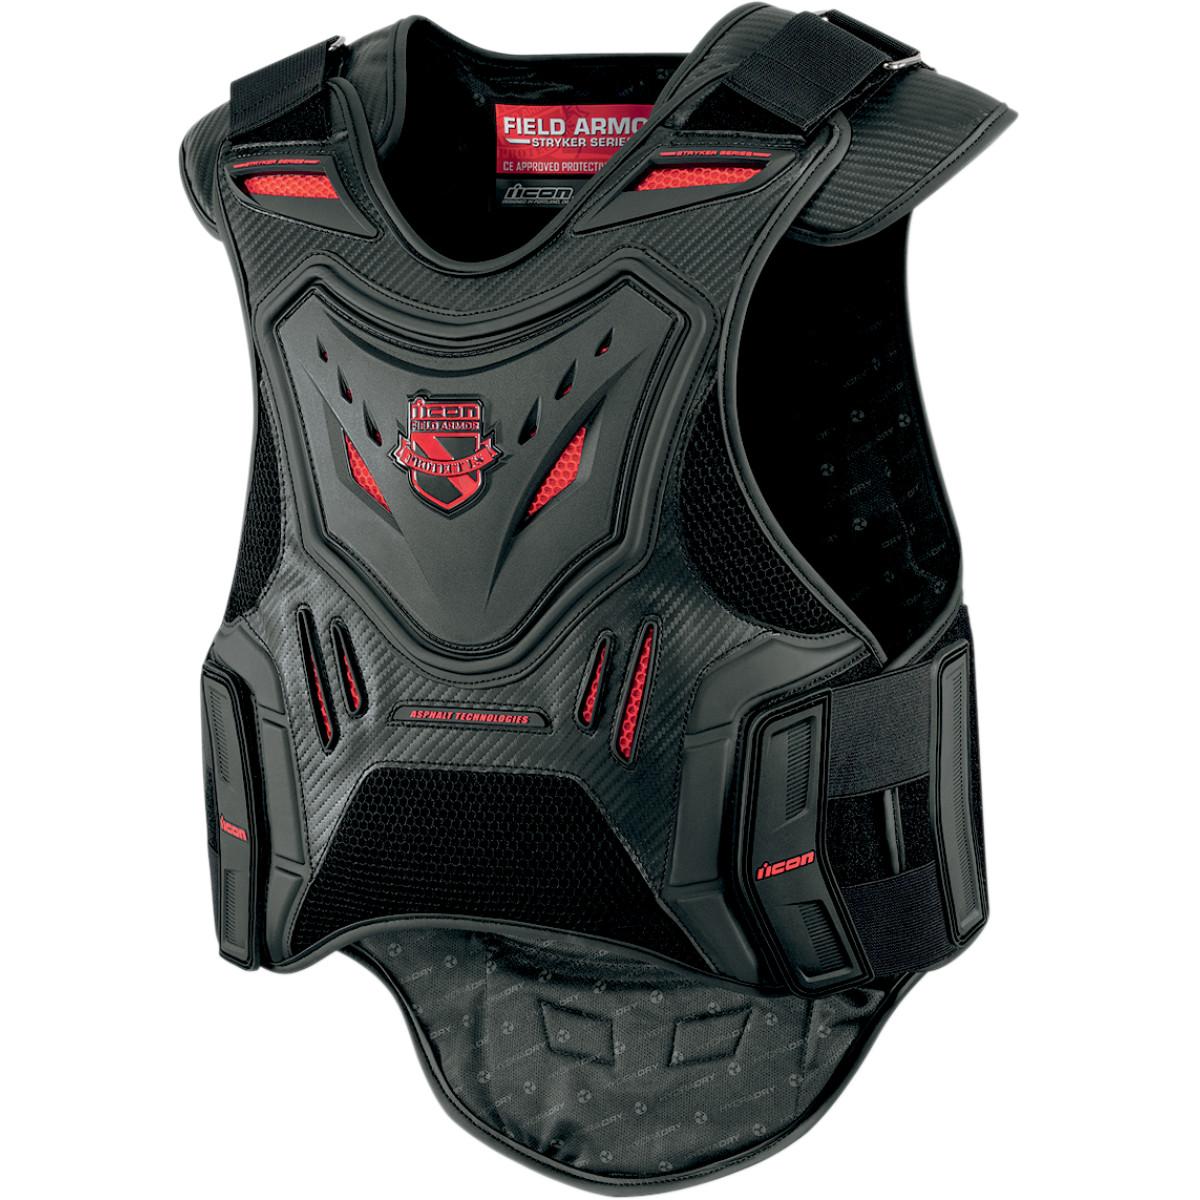 Icon Stryker Field Armor Motorcycle Vest Black Red